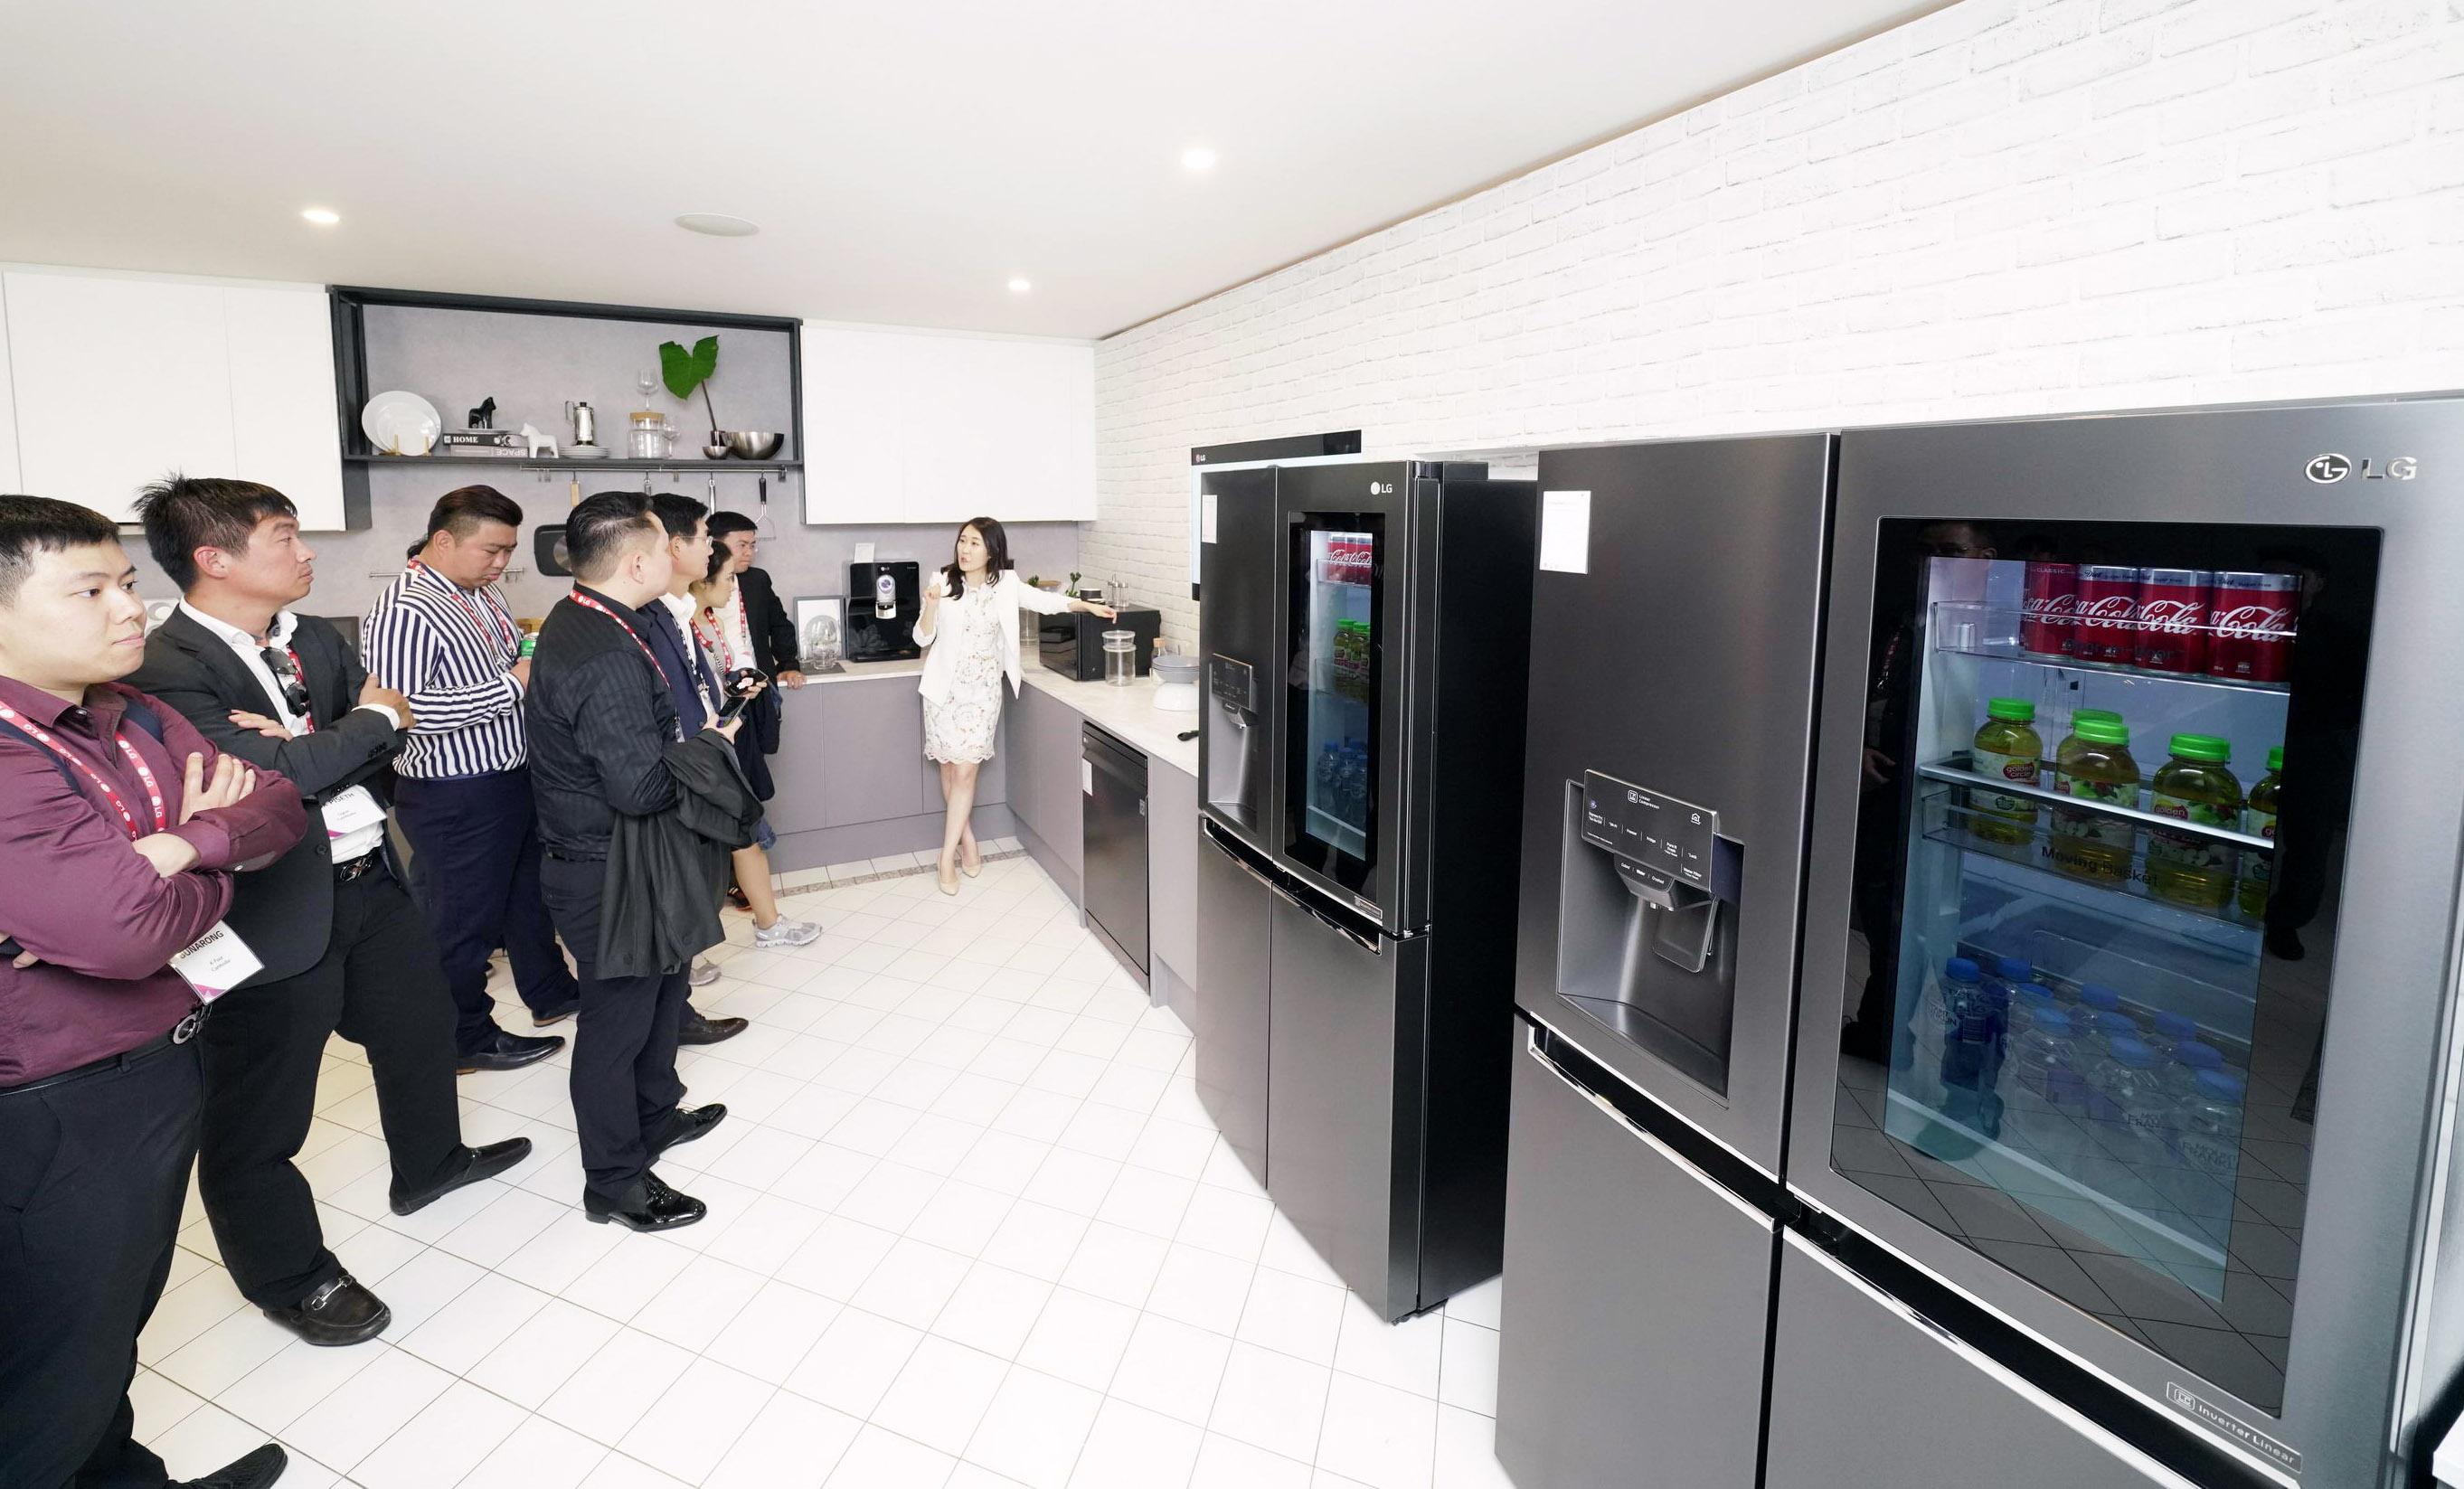 LG전자가 12일부터 이틀간 호주 시드니에서 올해 첫 'LG 이노페스트(LG InnoFest)'를 열었다. LG전자는 시드니 근교의 일반 주택을 'LG 홈(LG Home)'으로 꾸며 고객들이 실제 주거공간에서 제품을 직접 경험할 수 있도록 했다. LG 이노페스트 참가자들이 주방에서 '노크온 매직스페이스 냉장고', 광파오븐, 정수기 등 다양한 주방가전을 체험하고 있다.